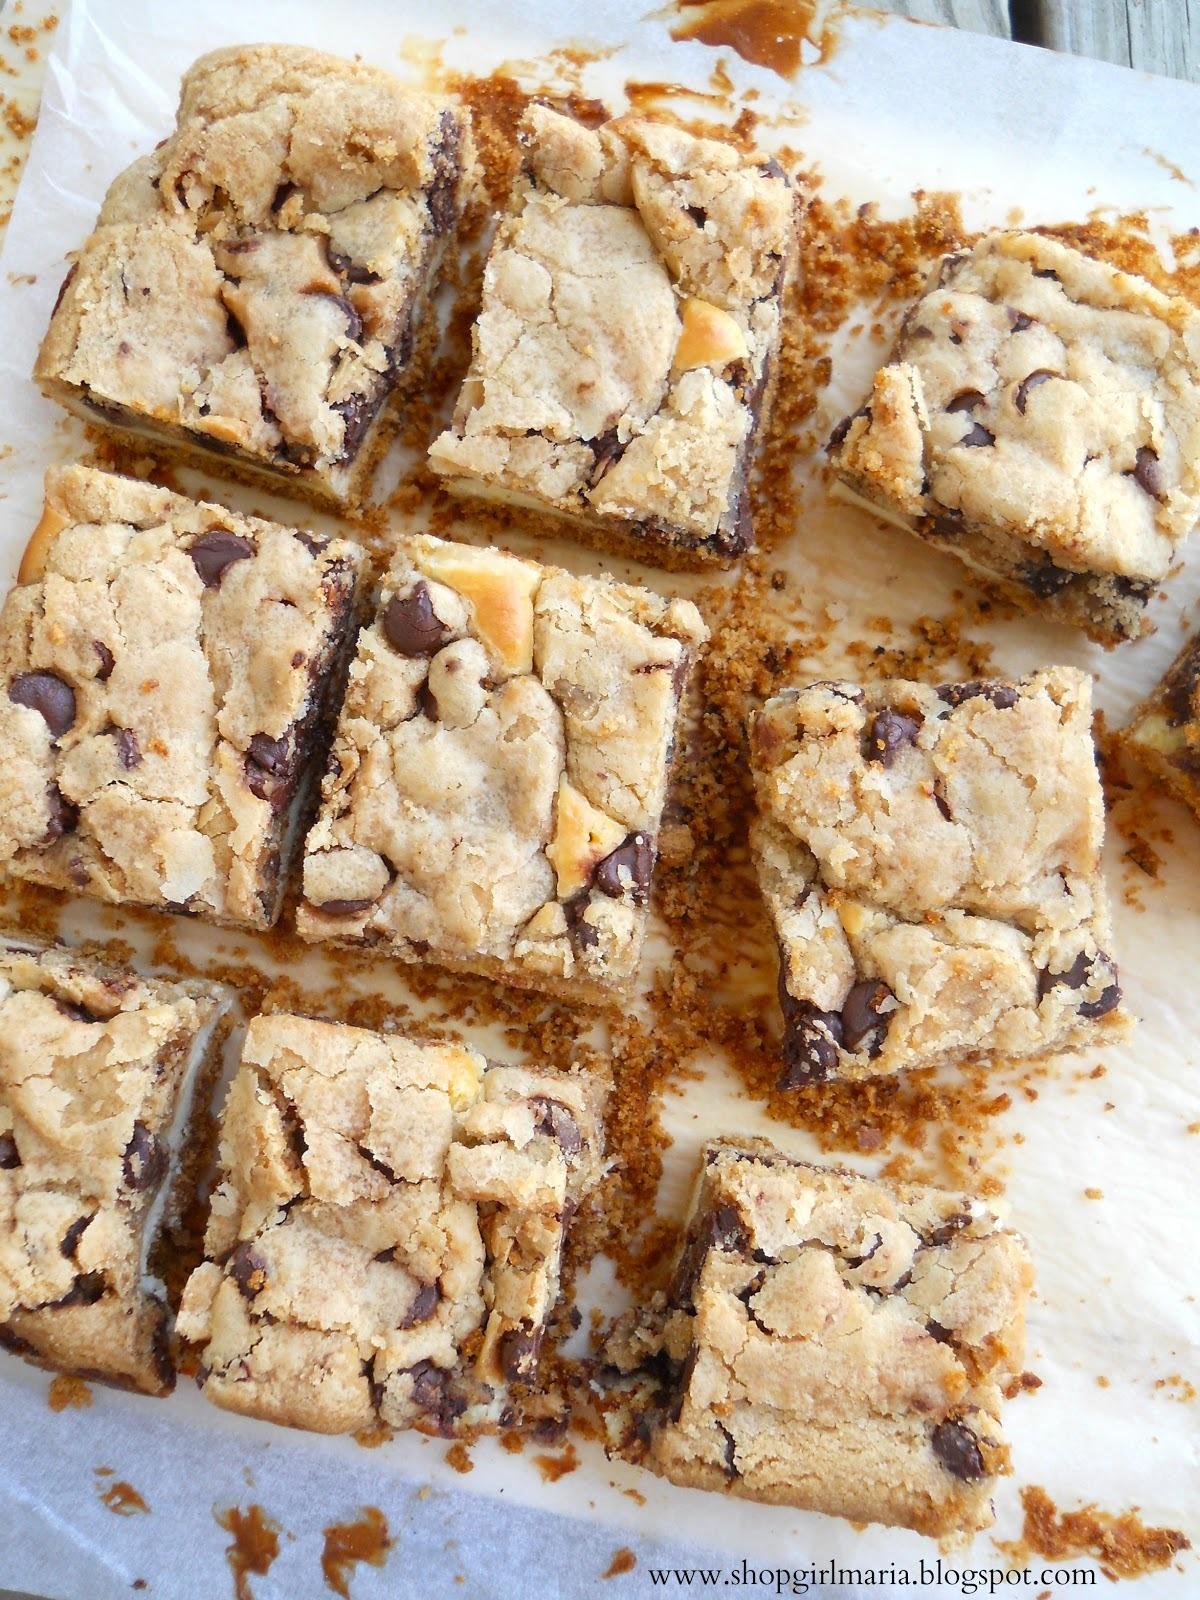 Recipe: Chocolate Chip Cookie Dough Cheesecake Bars